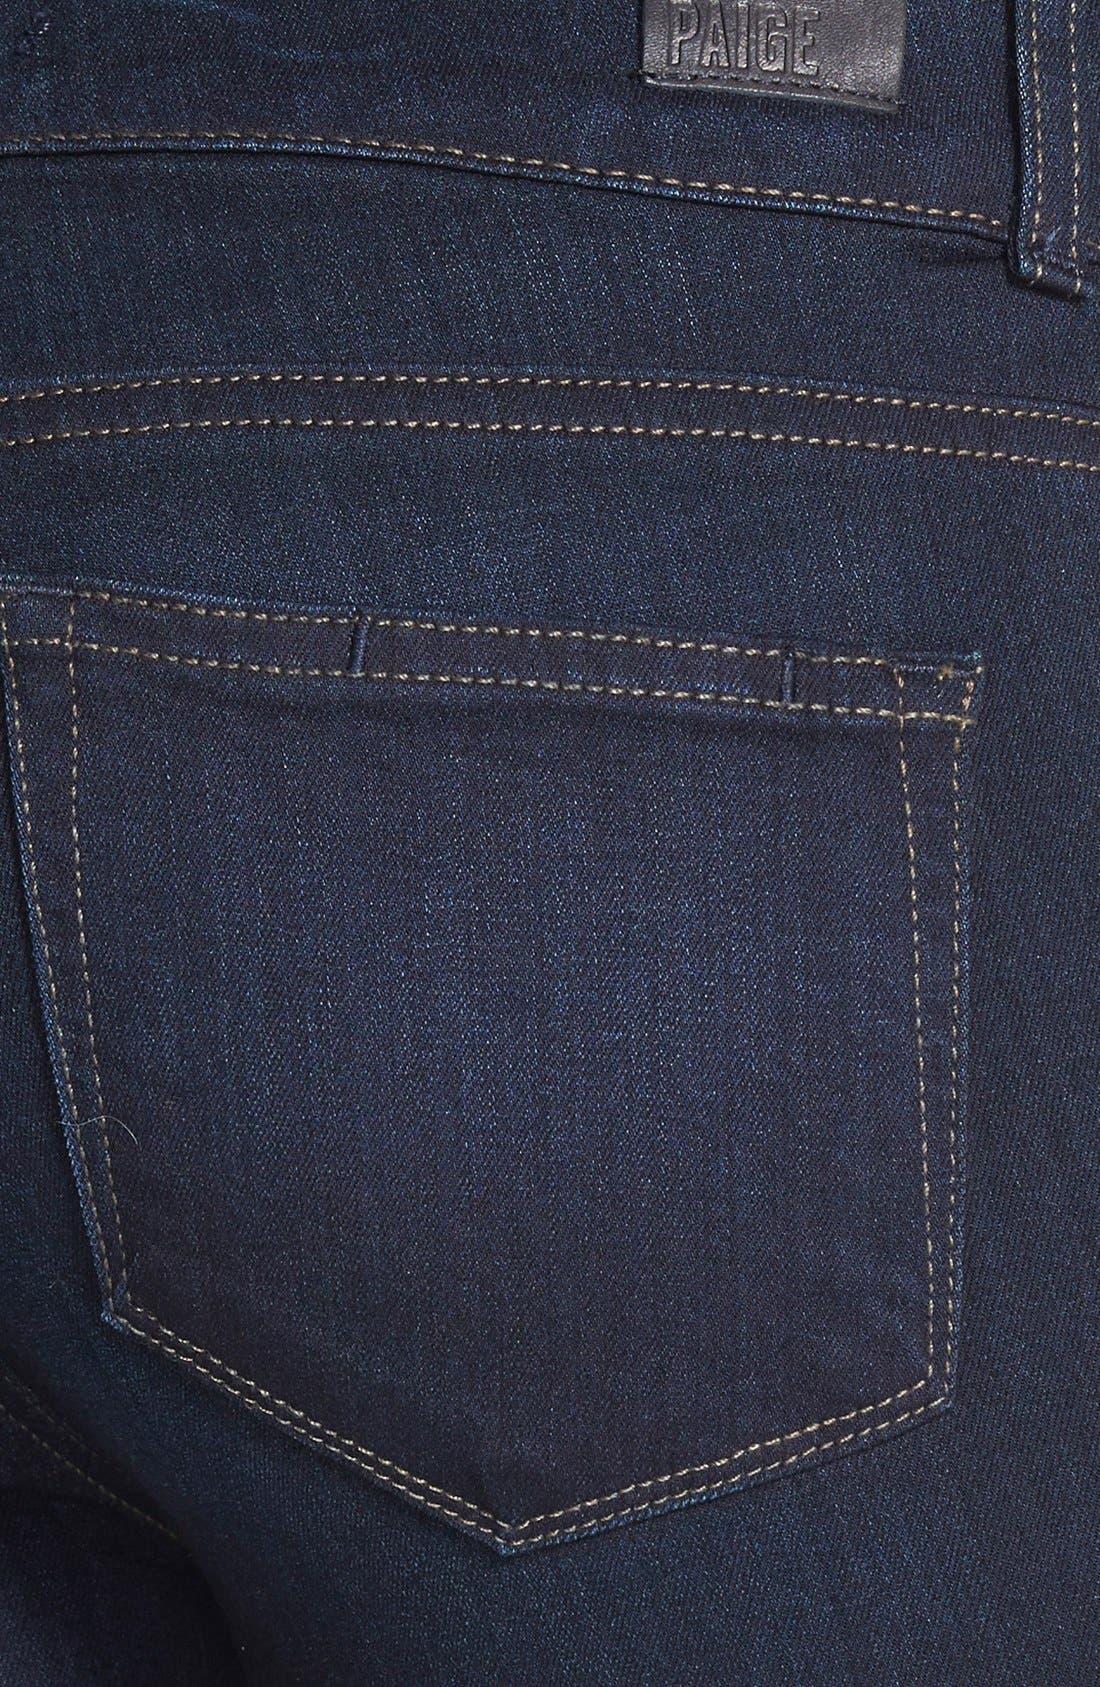 Alternate Image 3  - PAIGE 'Transcend - Hidden Hills' Bootcut Stretch Jeans (Mona) (Petite)